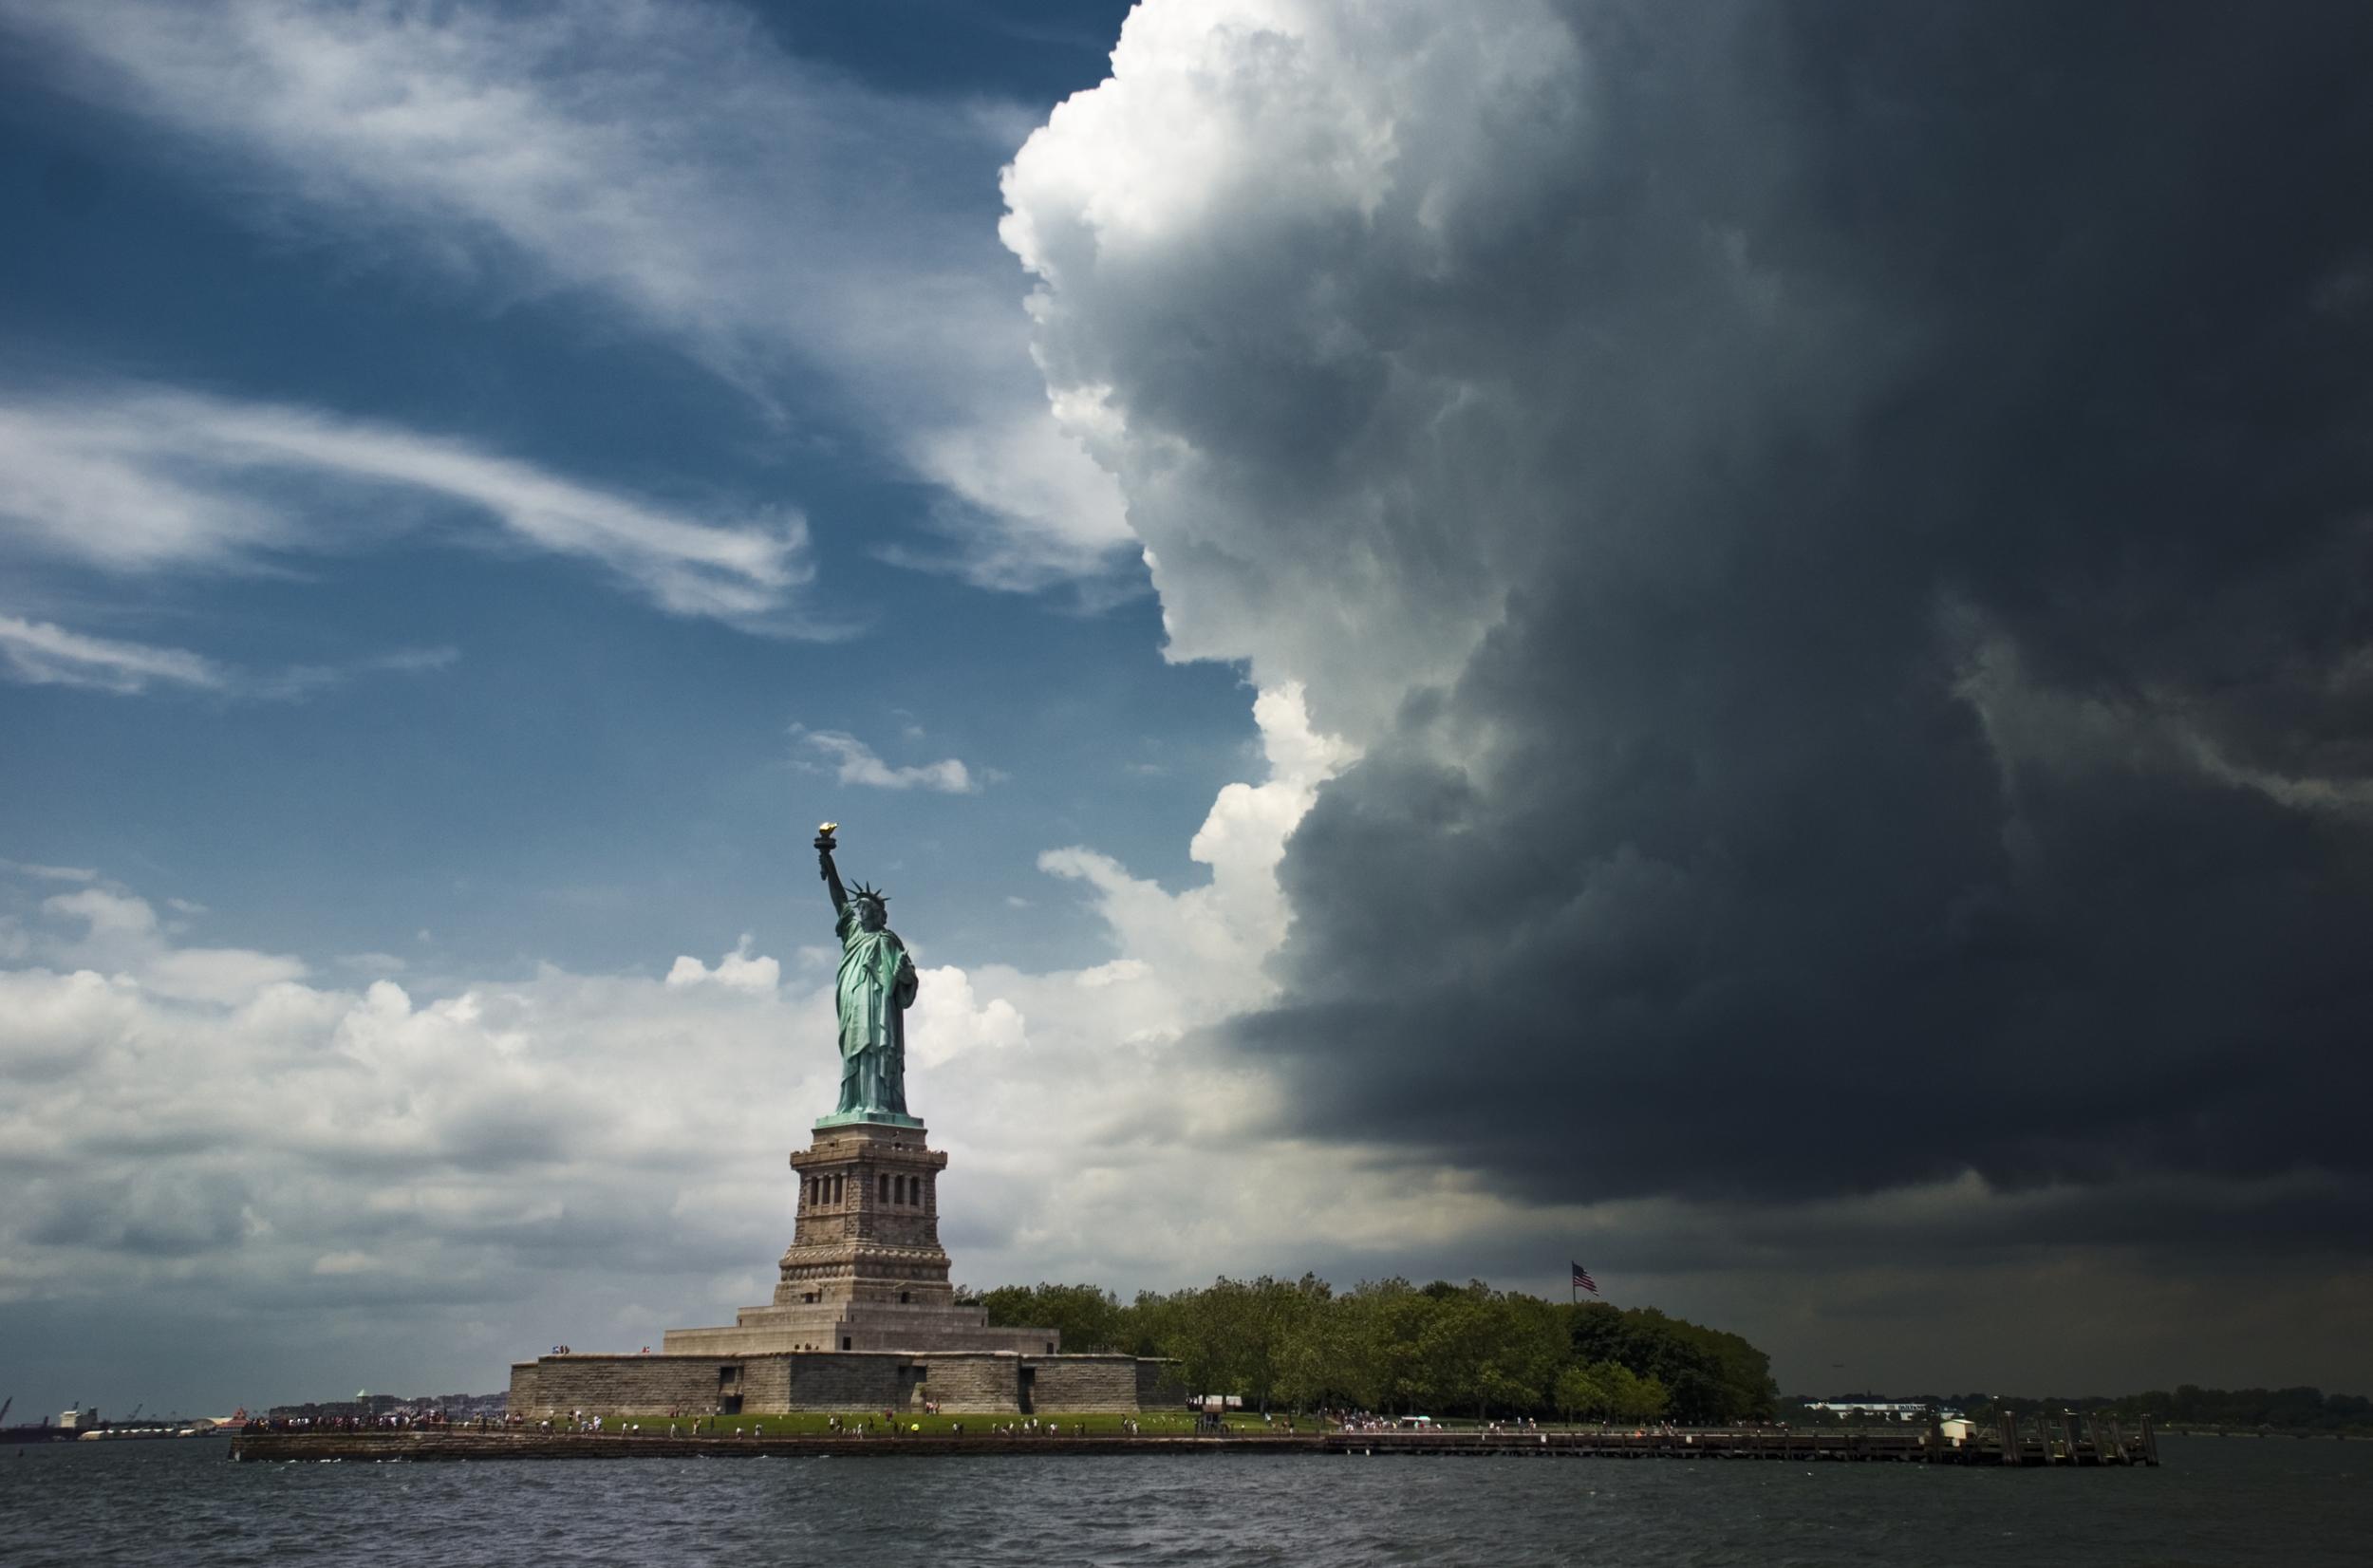 12_The storm.jpg